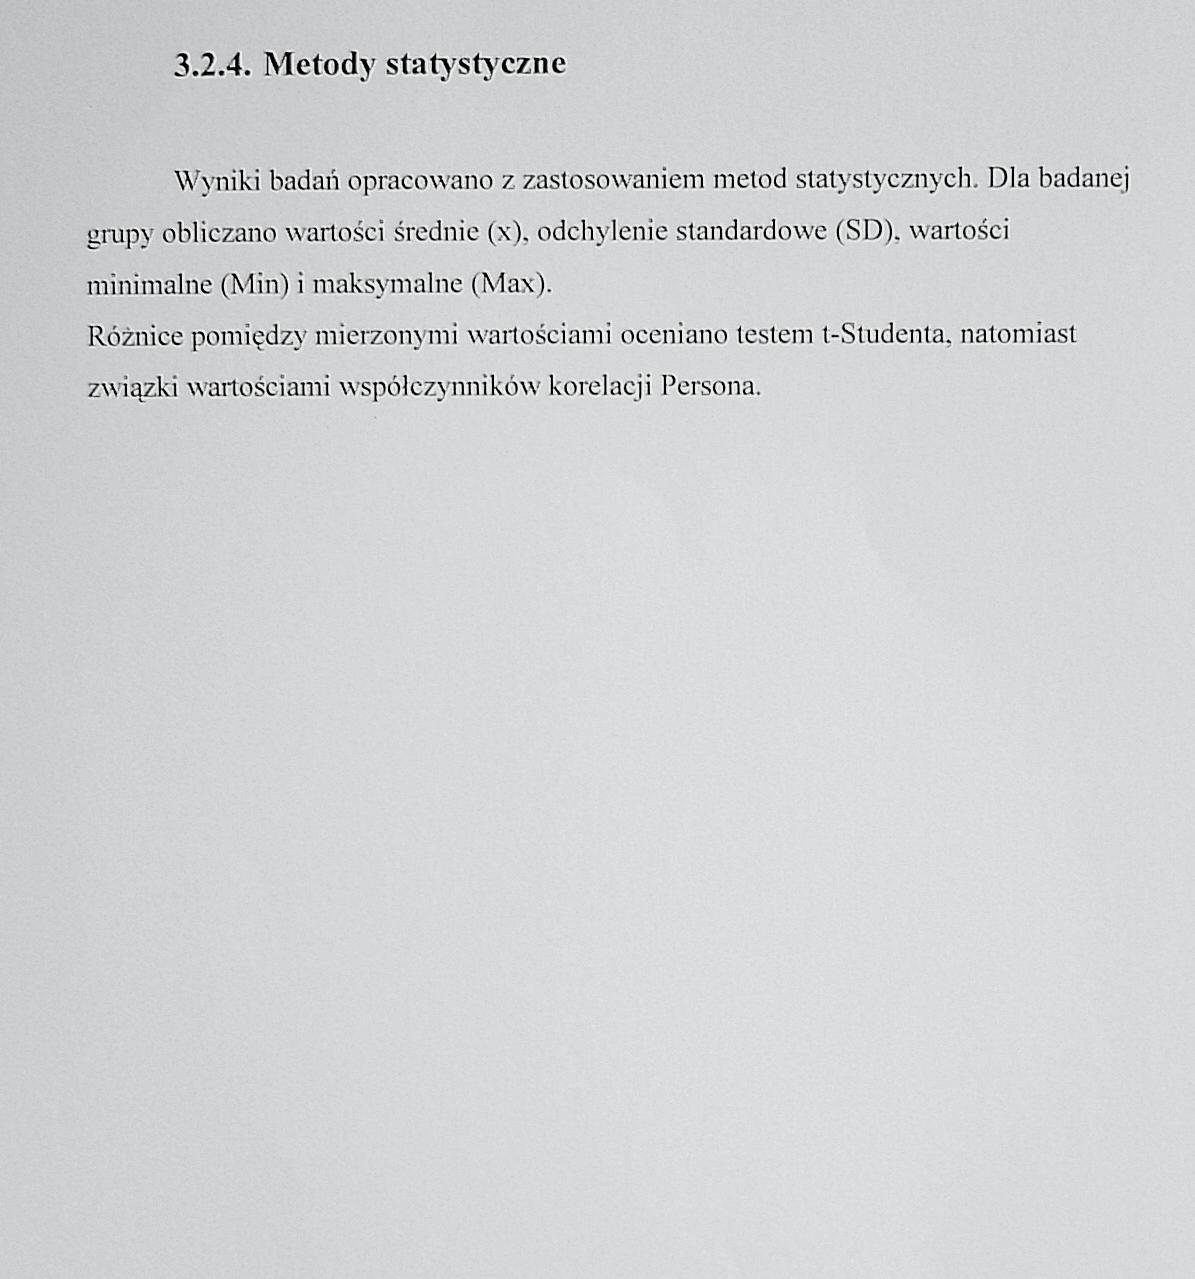 19_cr.jpg